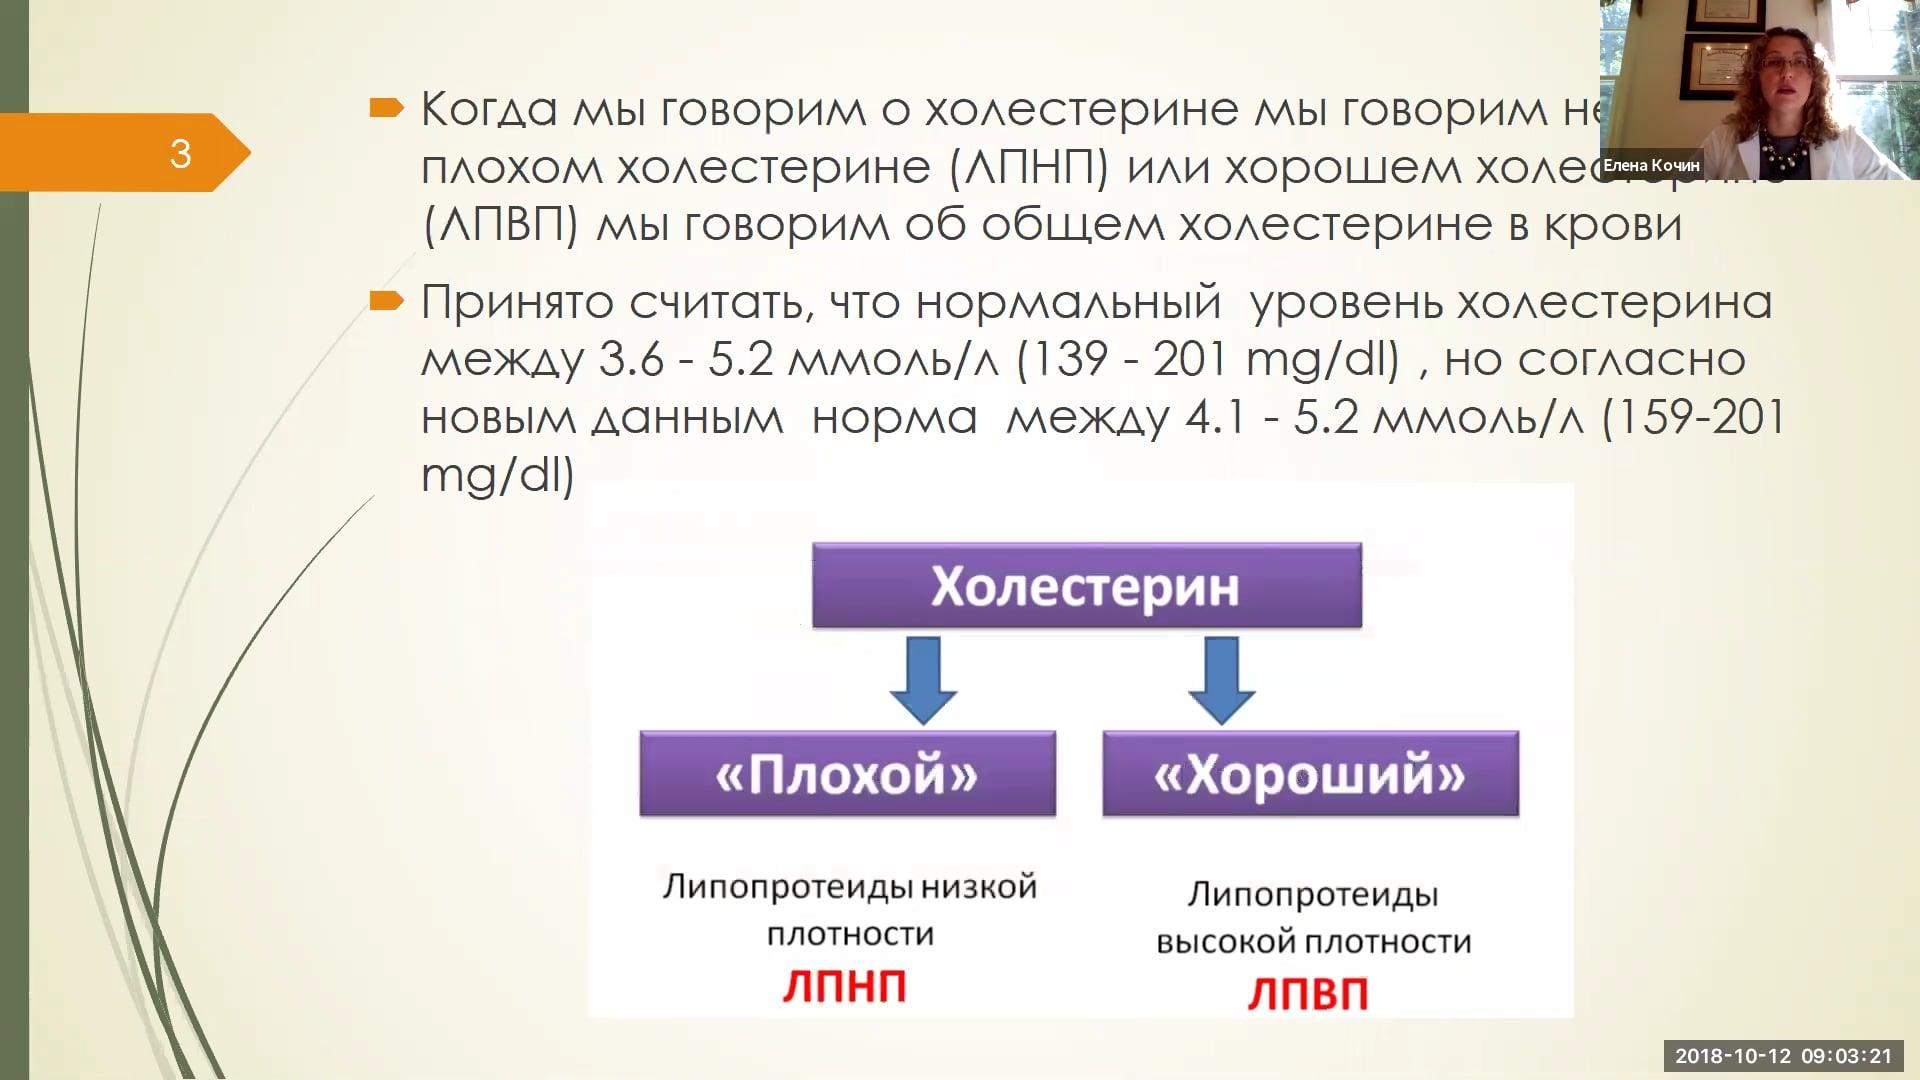 Холестерин, окситоцин и mTOR